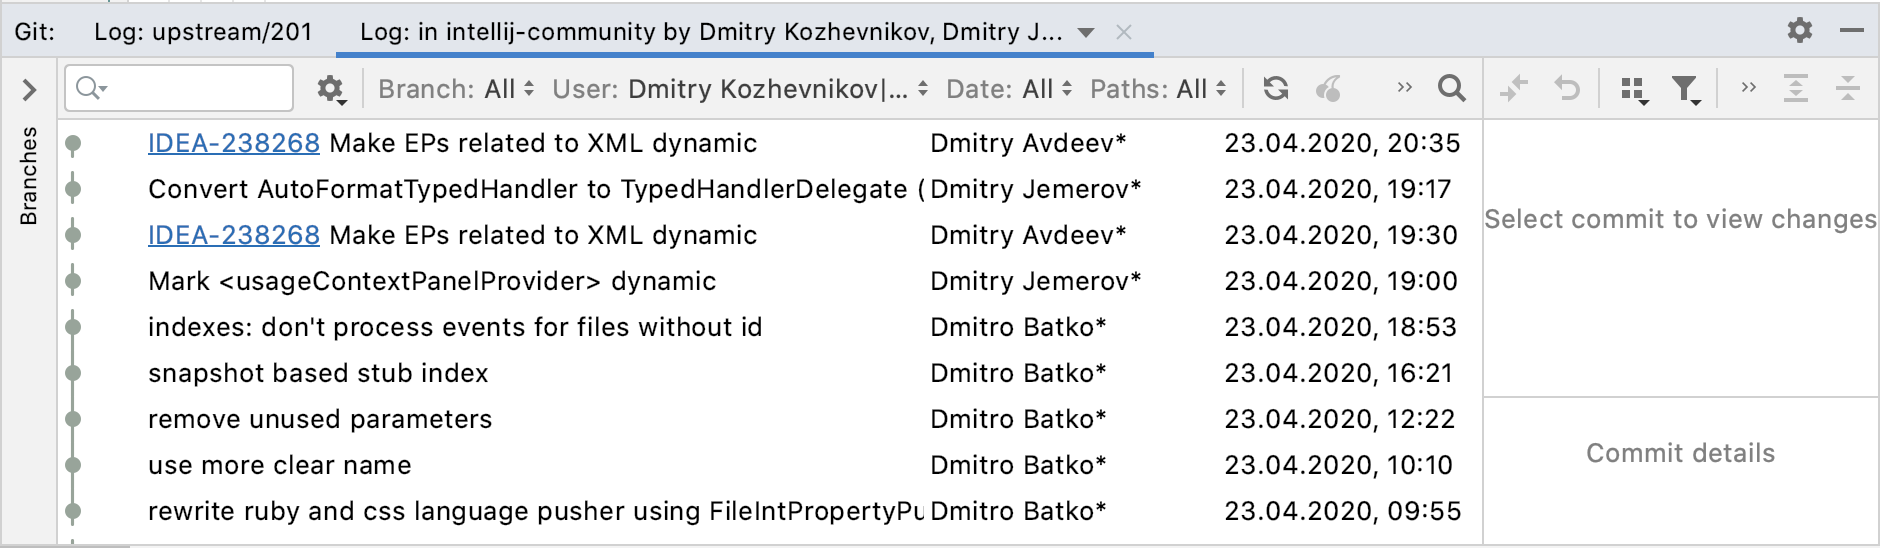 Log tab in the Git tool window filtered by username